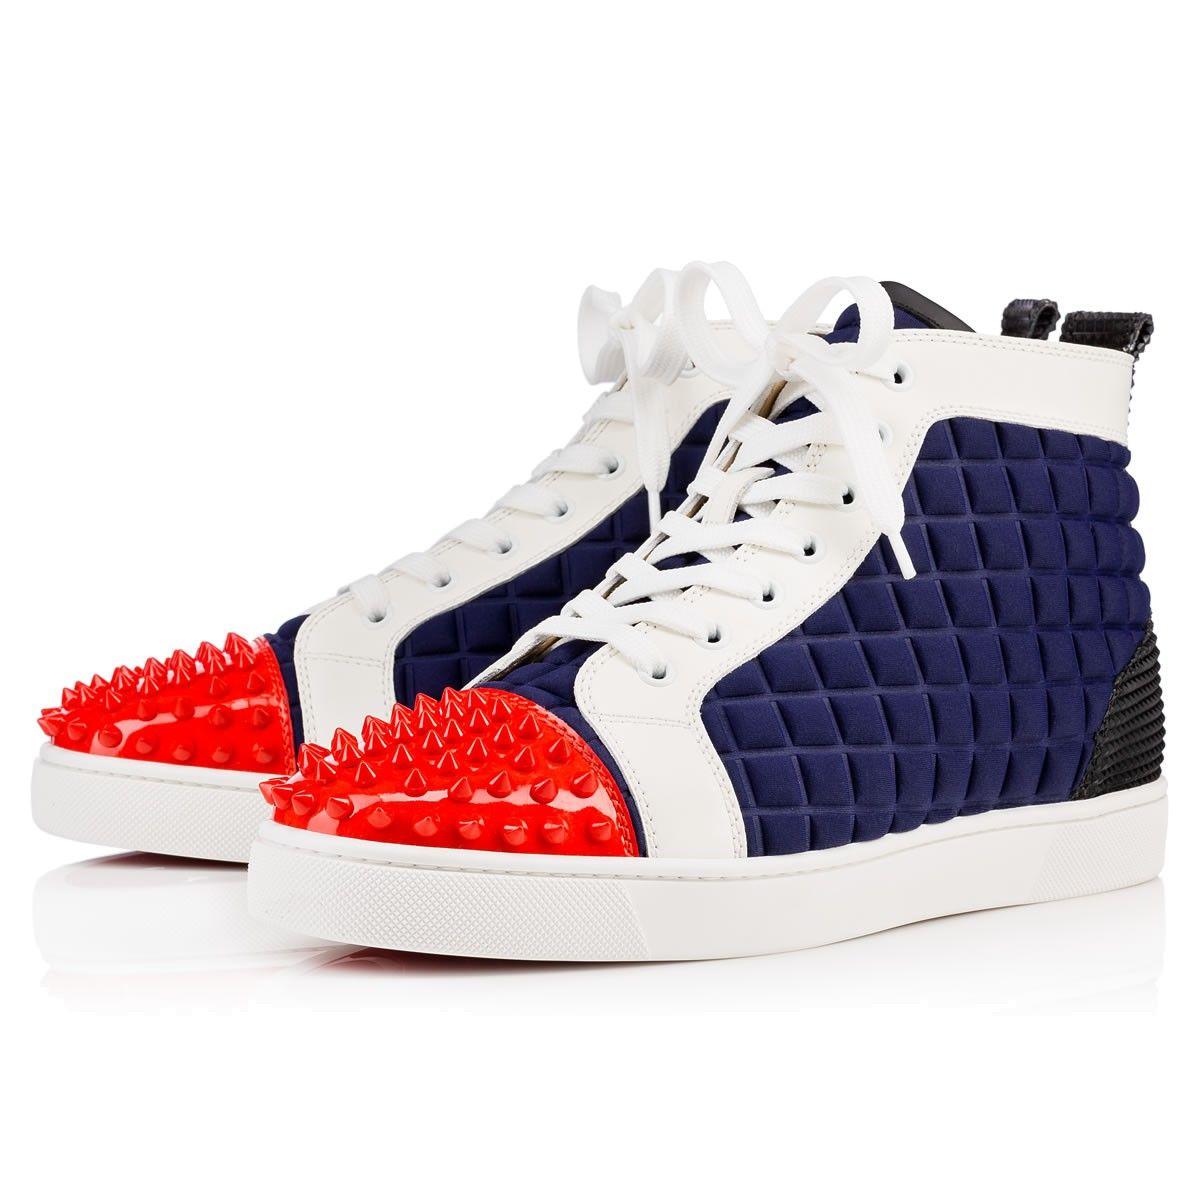 CHRISTIAN LOUBOUTIN Lou Spikes Men S Flat Version Multi Neoprene.   christianlouboutin  shoes